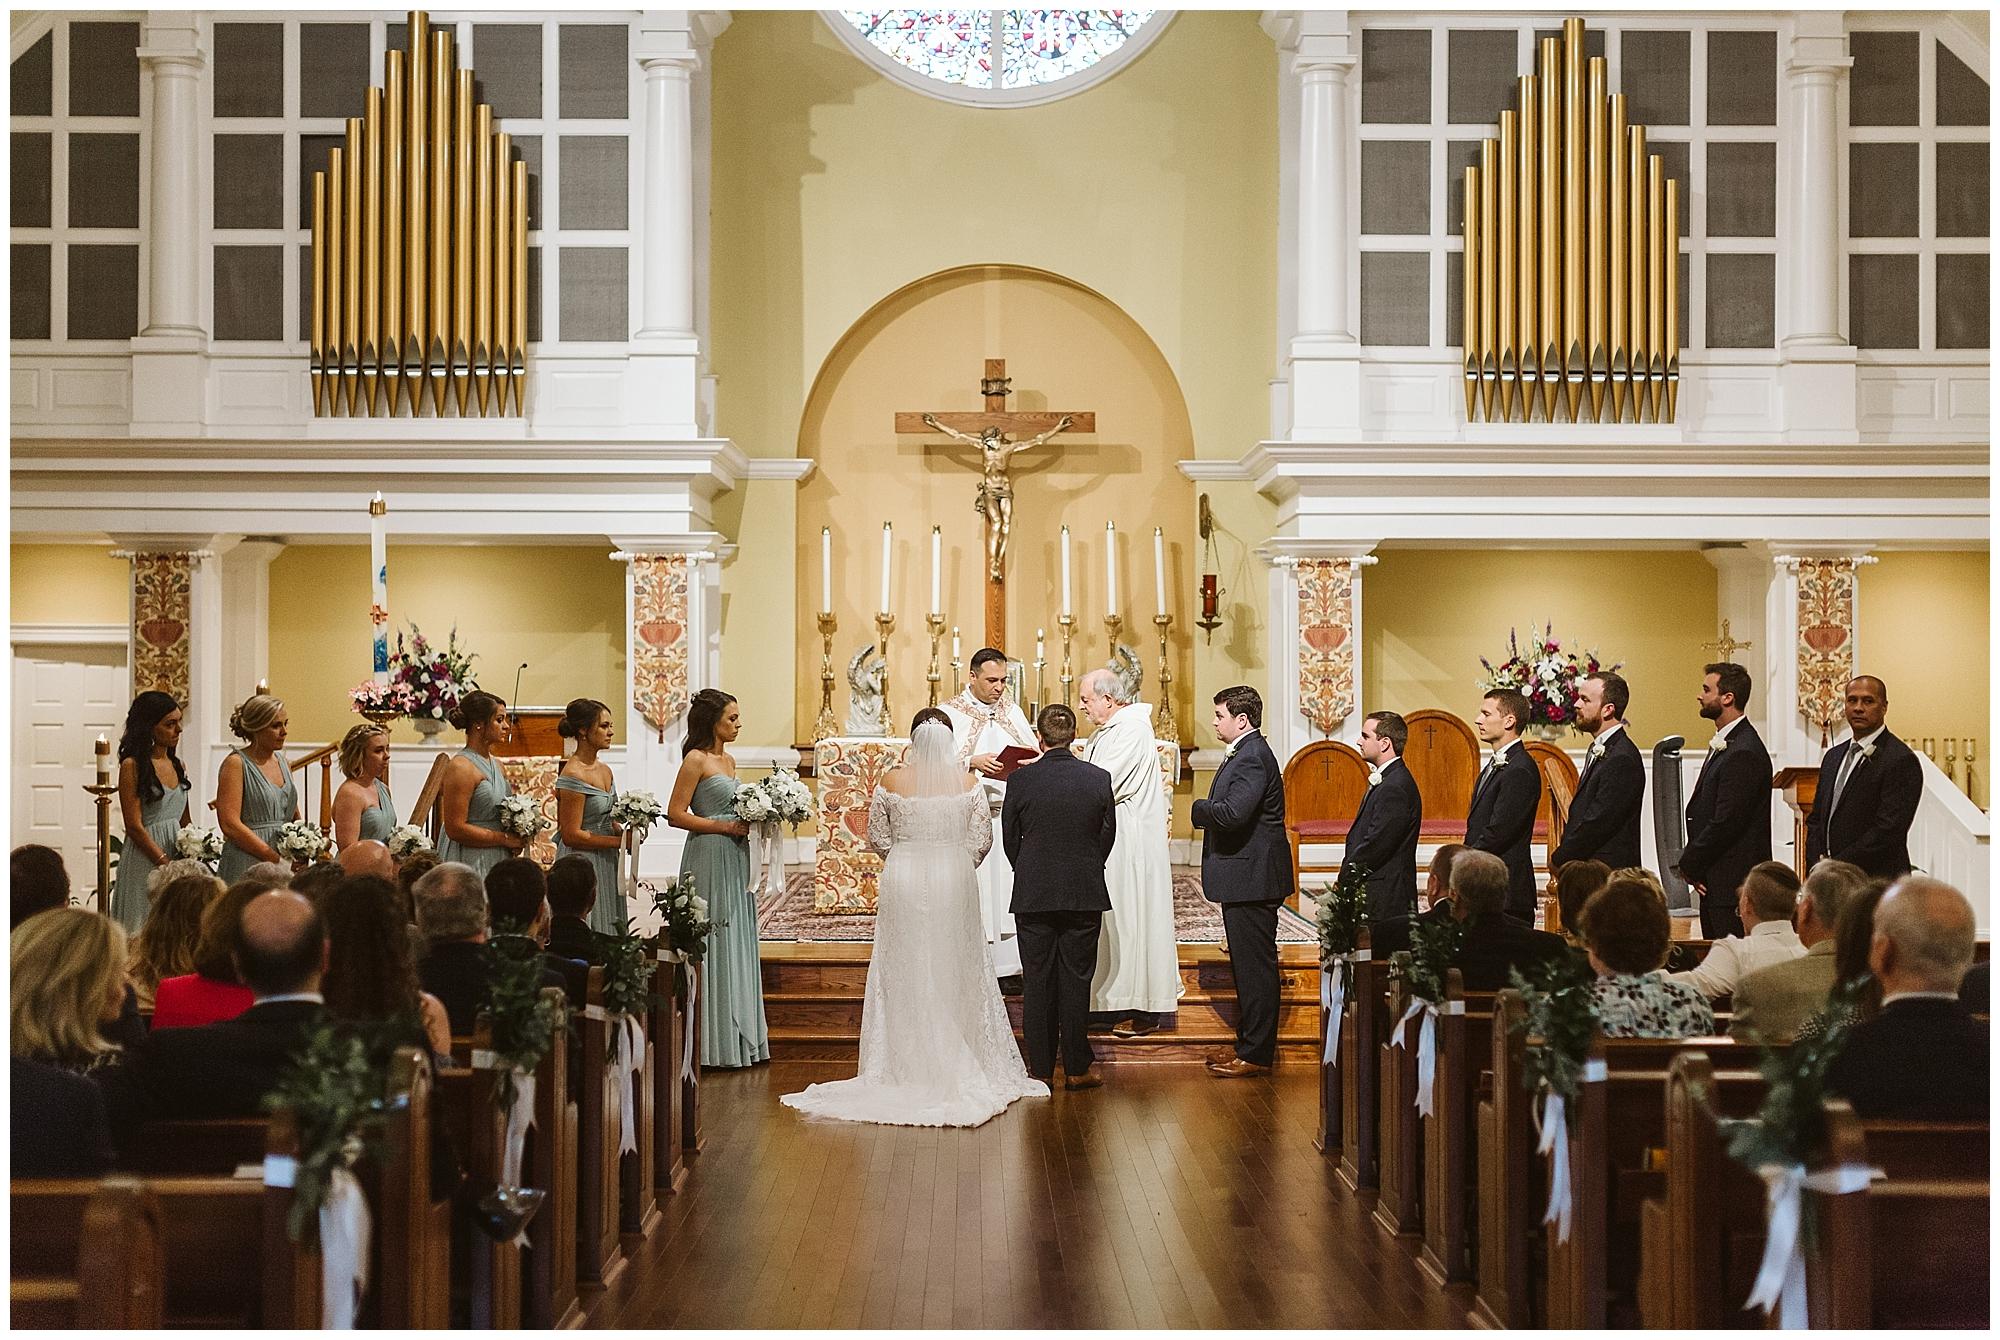 Oaks-at-salem-wedding-apex-photography-62.jpg